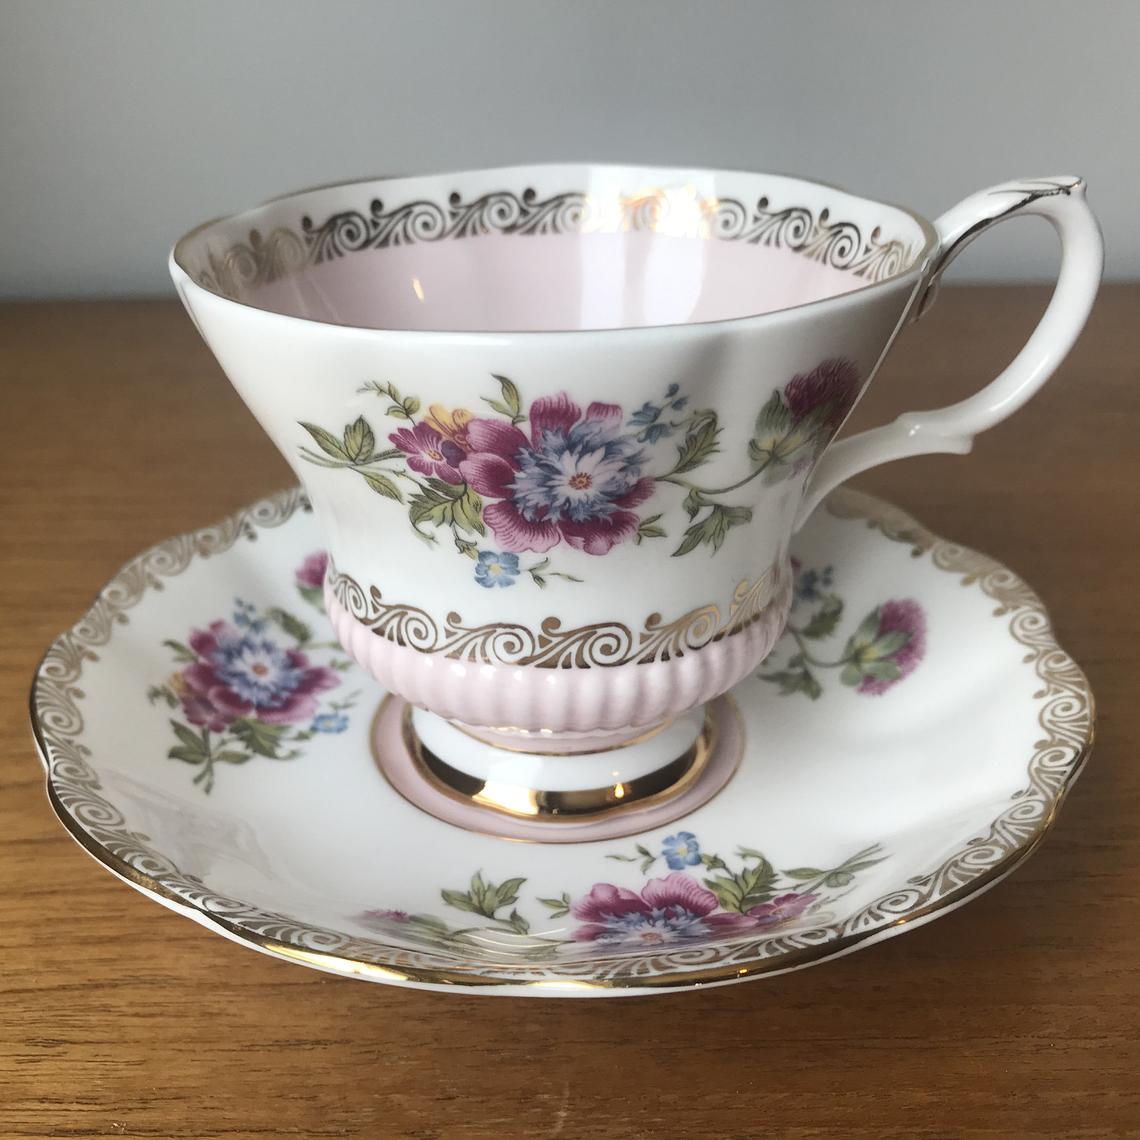 Royal Albert Reverie Series Tea Cup and Saucer, Pink Teacup and Saucer, Floral English Bone China